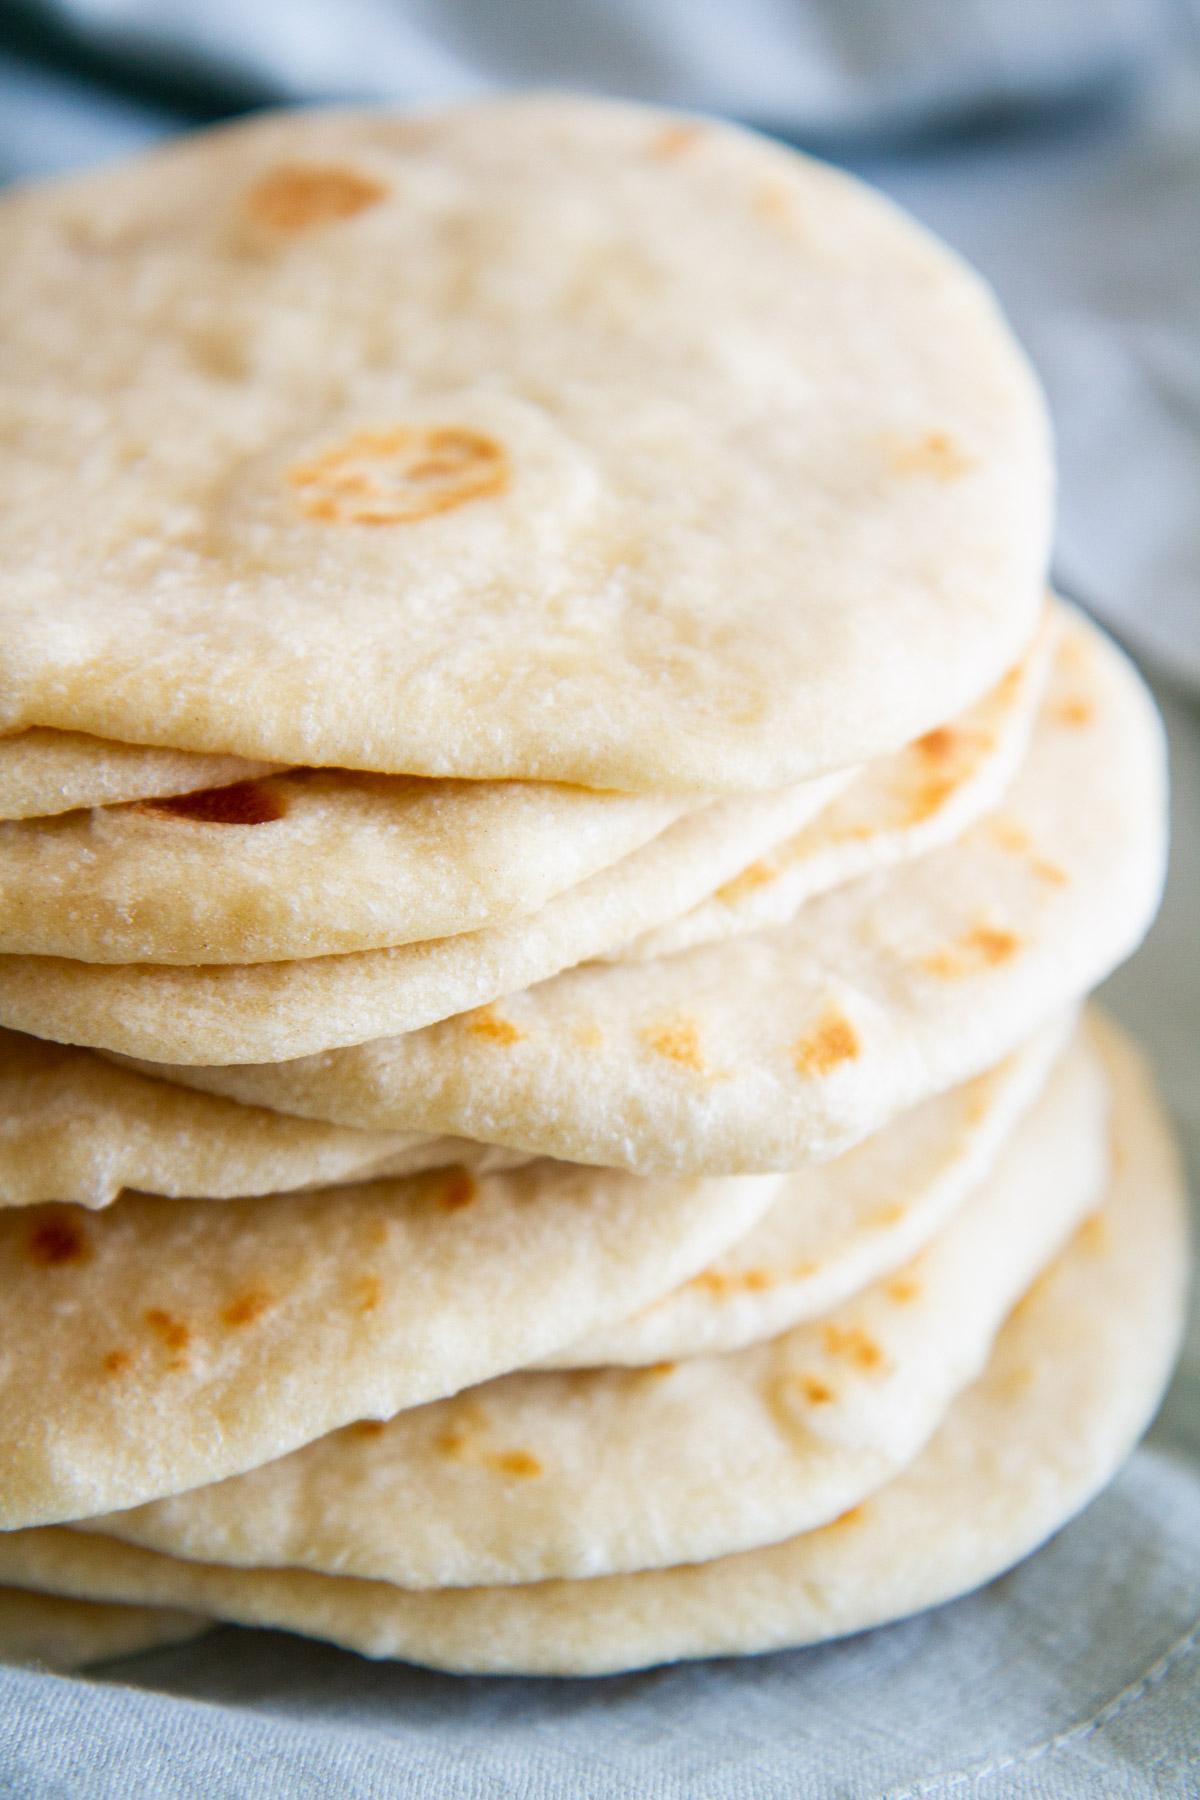 Homemade Soft Flour Tortillas -- delicious and exceedingly soft flour tortillas made from scratch with one special ingredient that makes them so good. @girlversusdough #girlversusdough #Mexicanfood #homemadebread #tacos